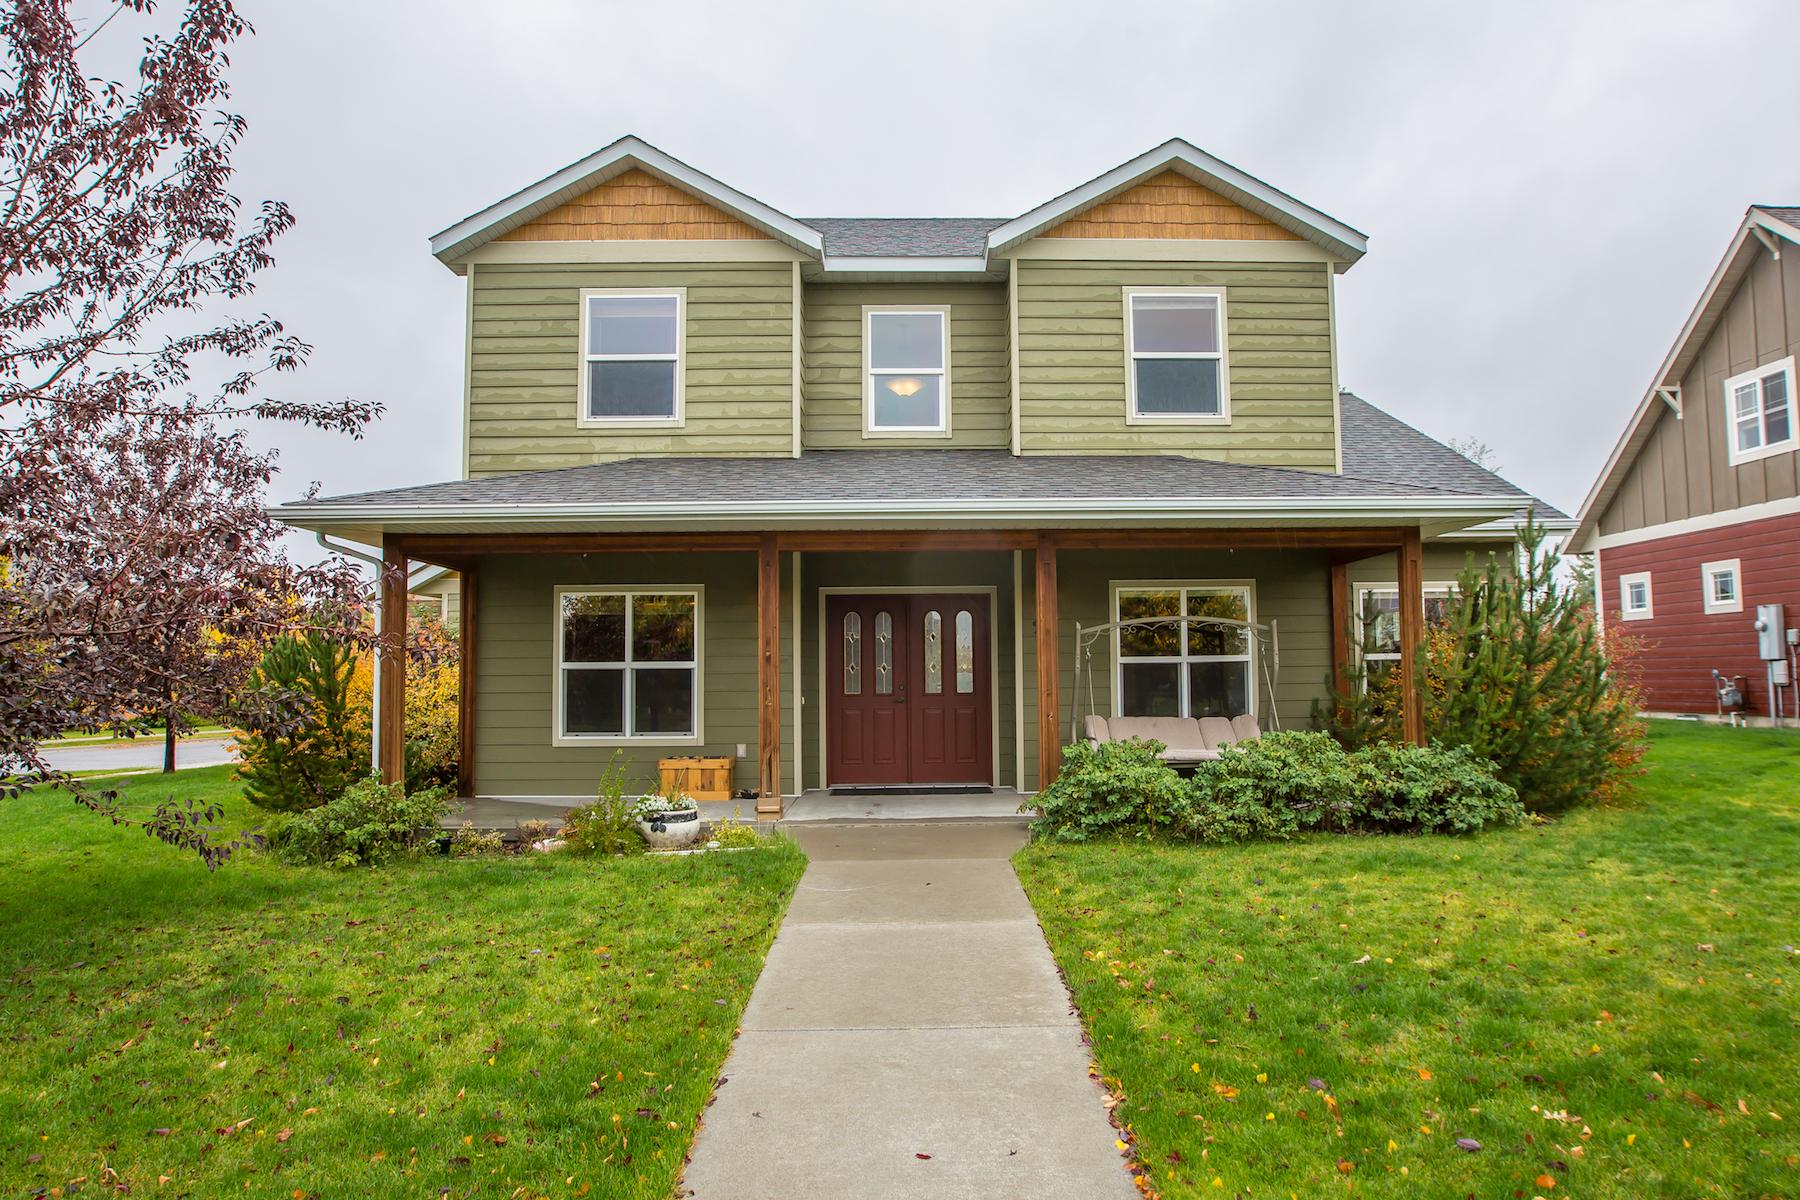 Villa per Vendita alle ore Forest Glen 984 Forestglen Bozeman, Montana, 59718 Stati Uniti